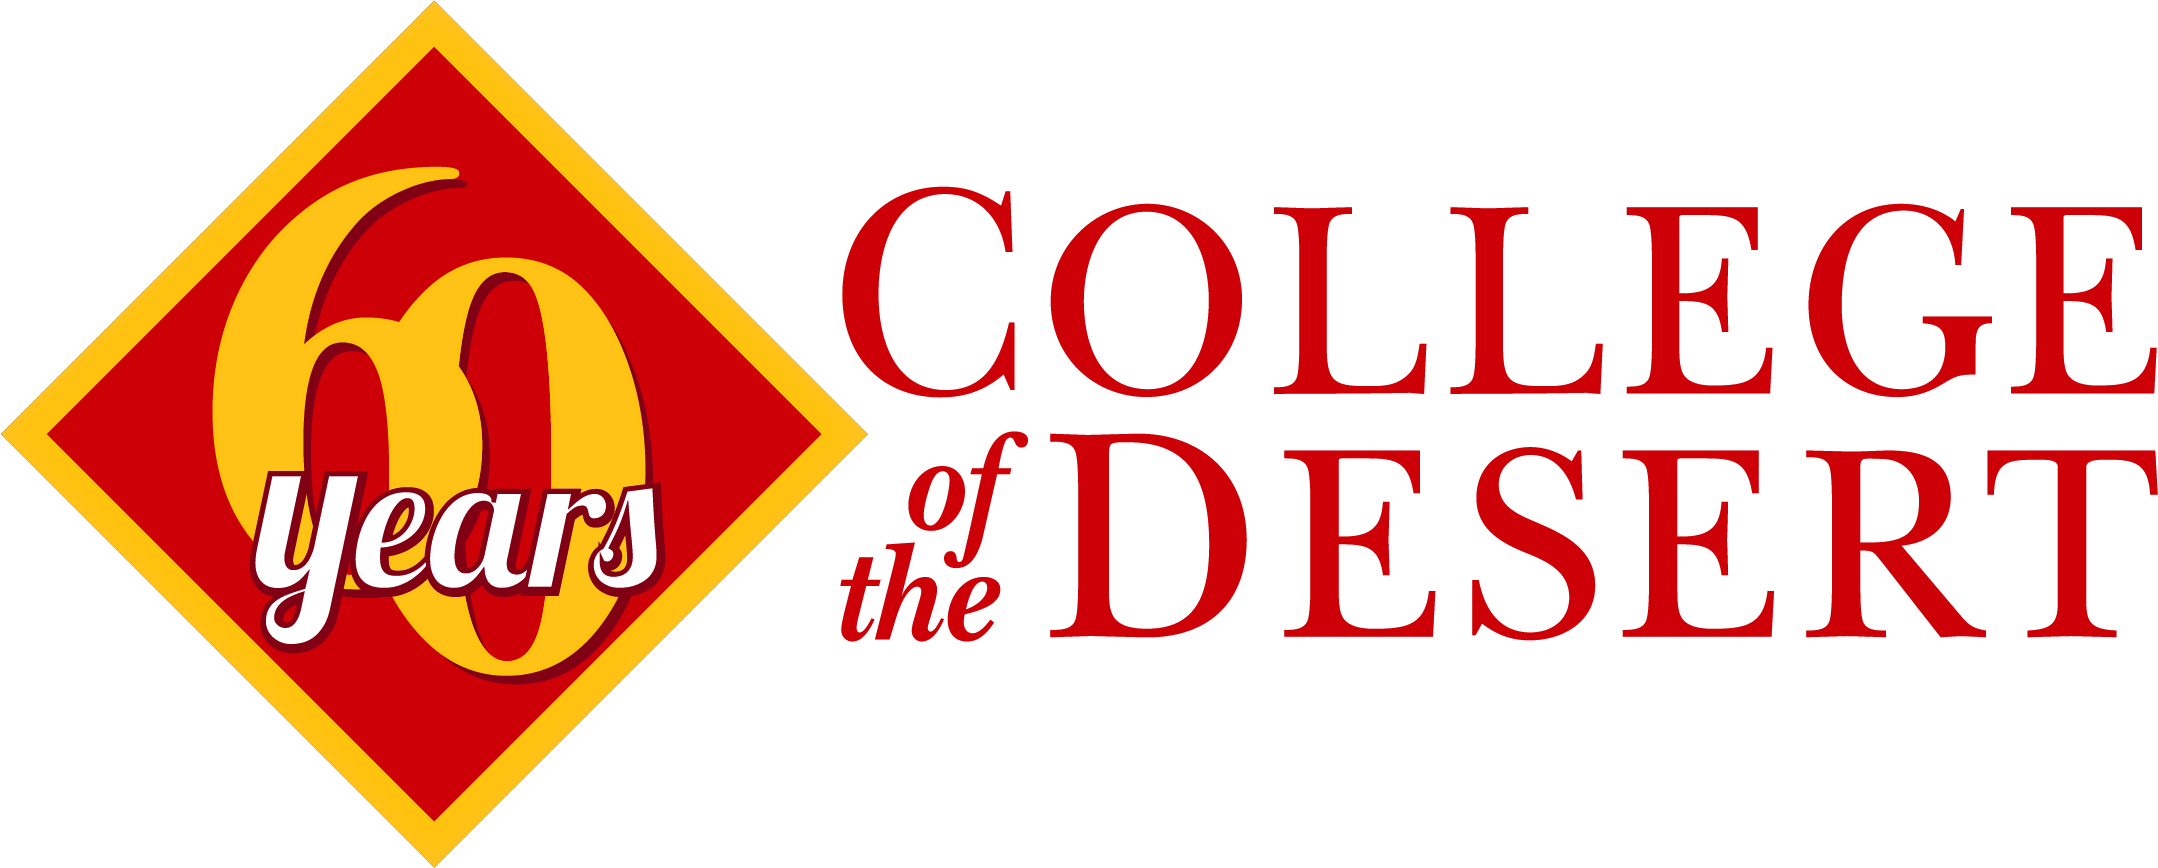 College of the Desert 60 years